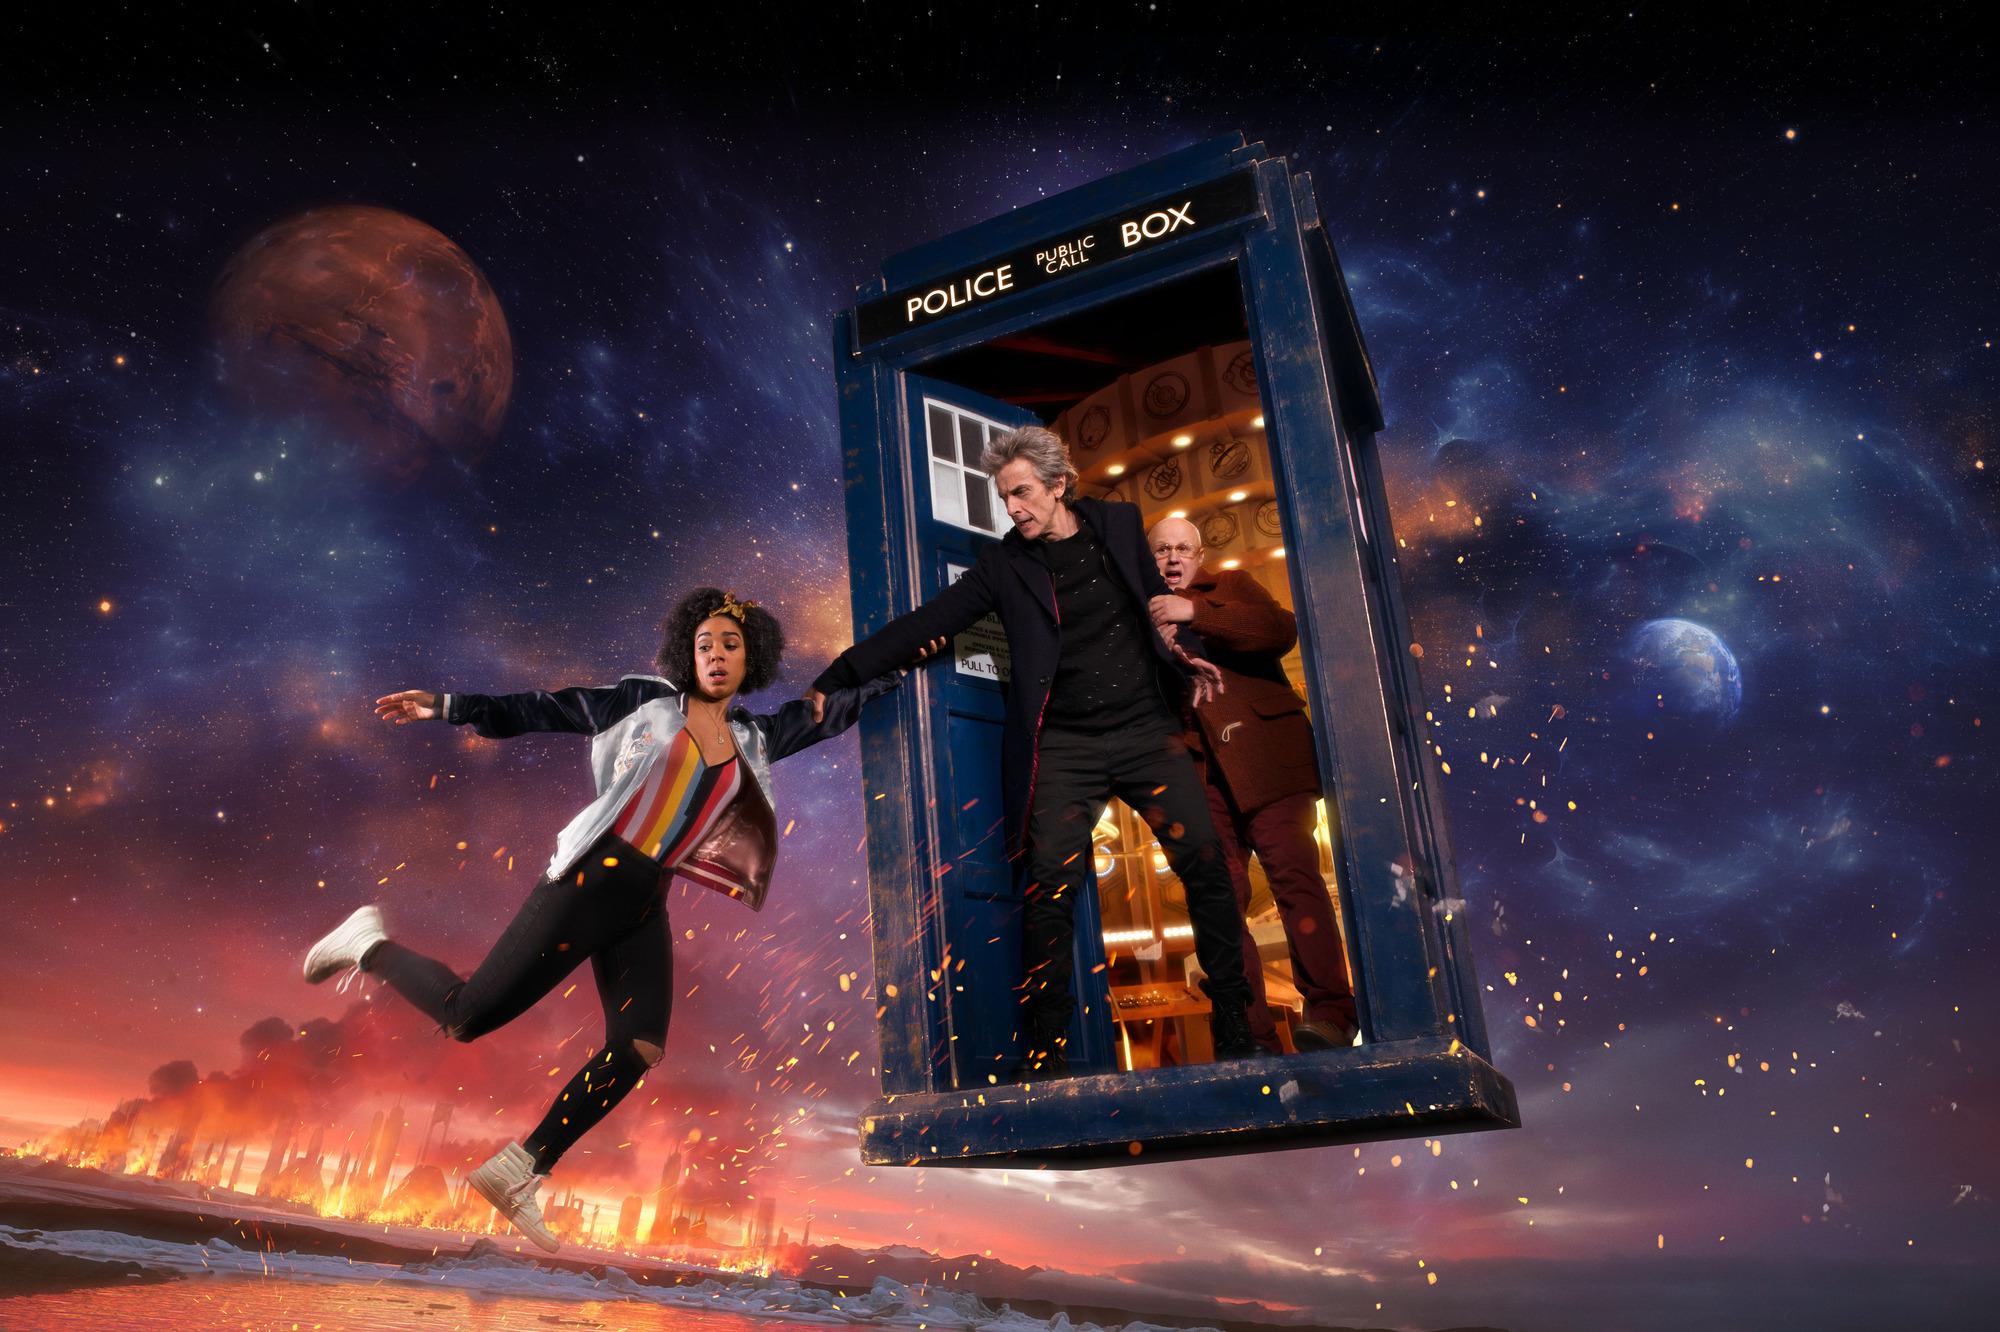 Series 10 Image (Credit: BBC/BBC Worldwide/Shutterstock)